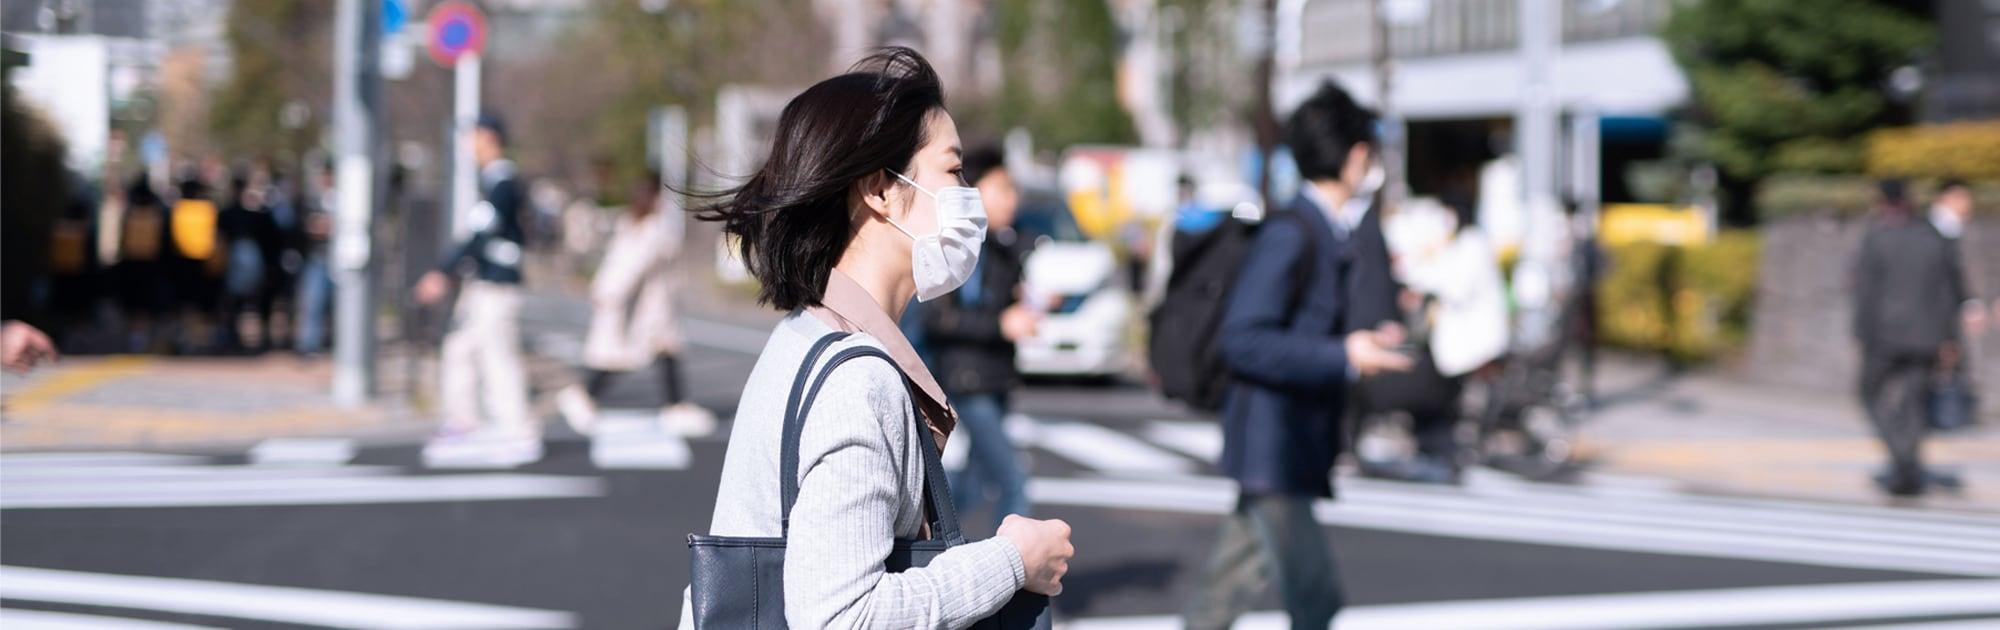 woman wearing mask walking